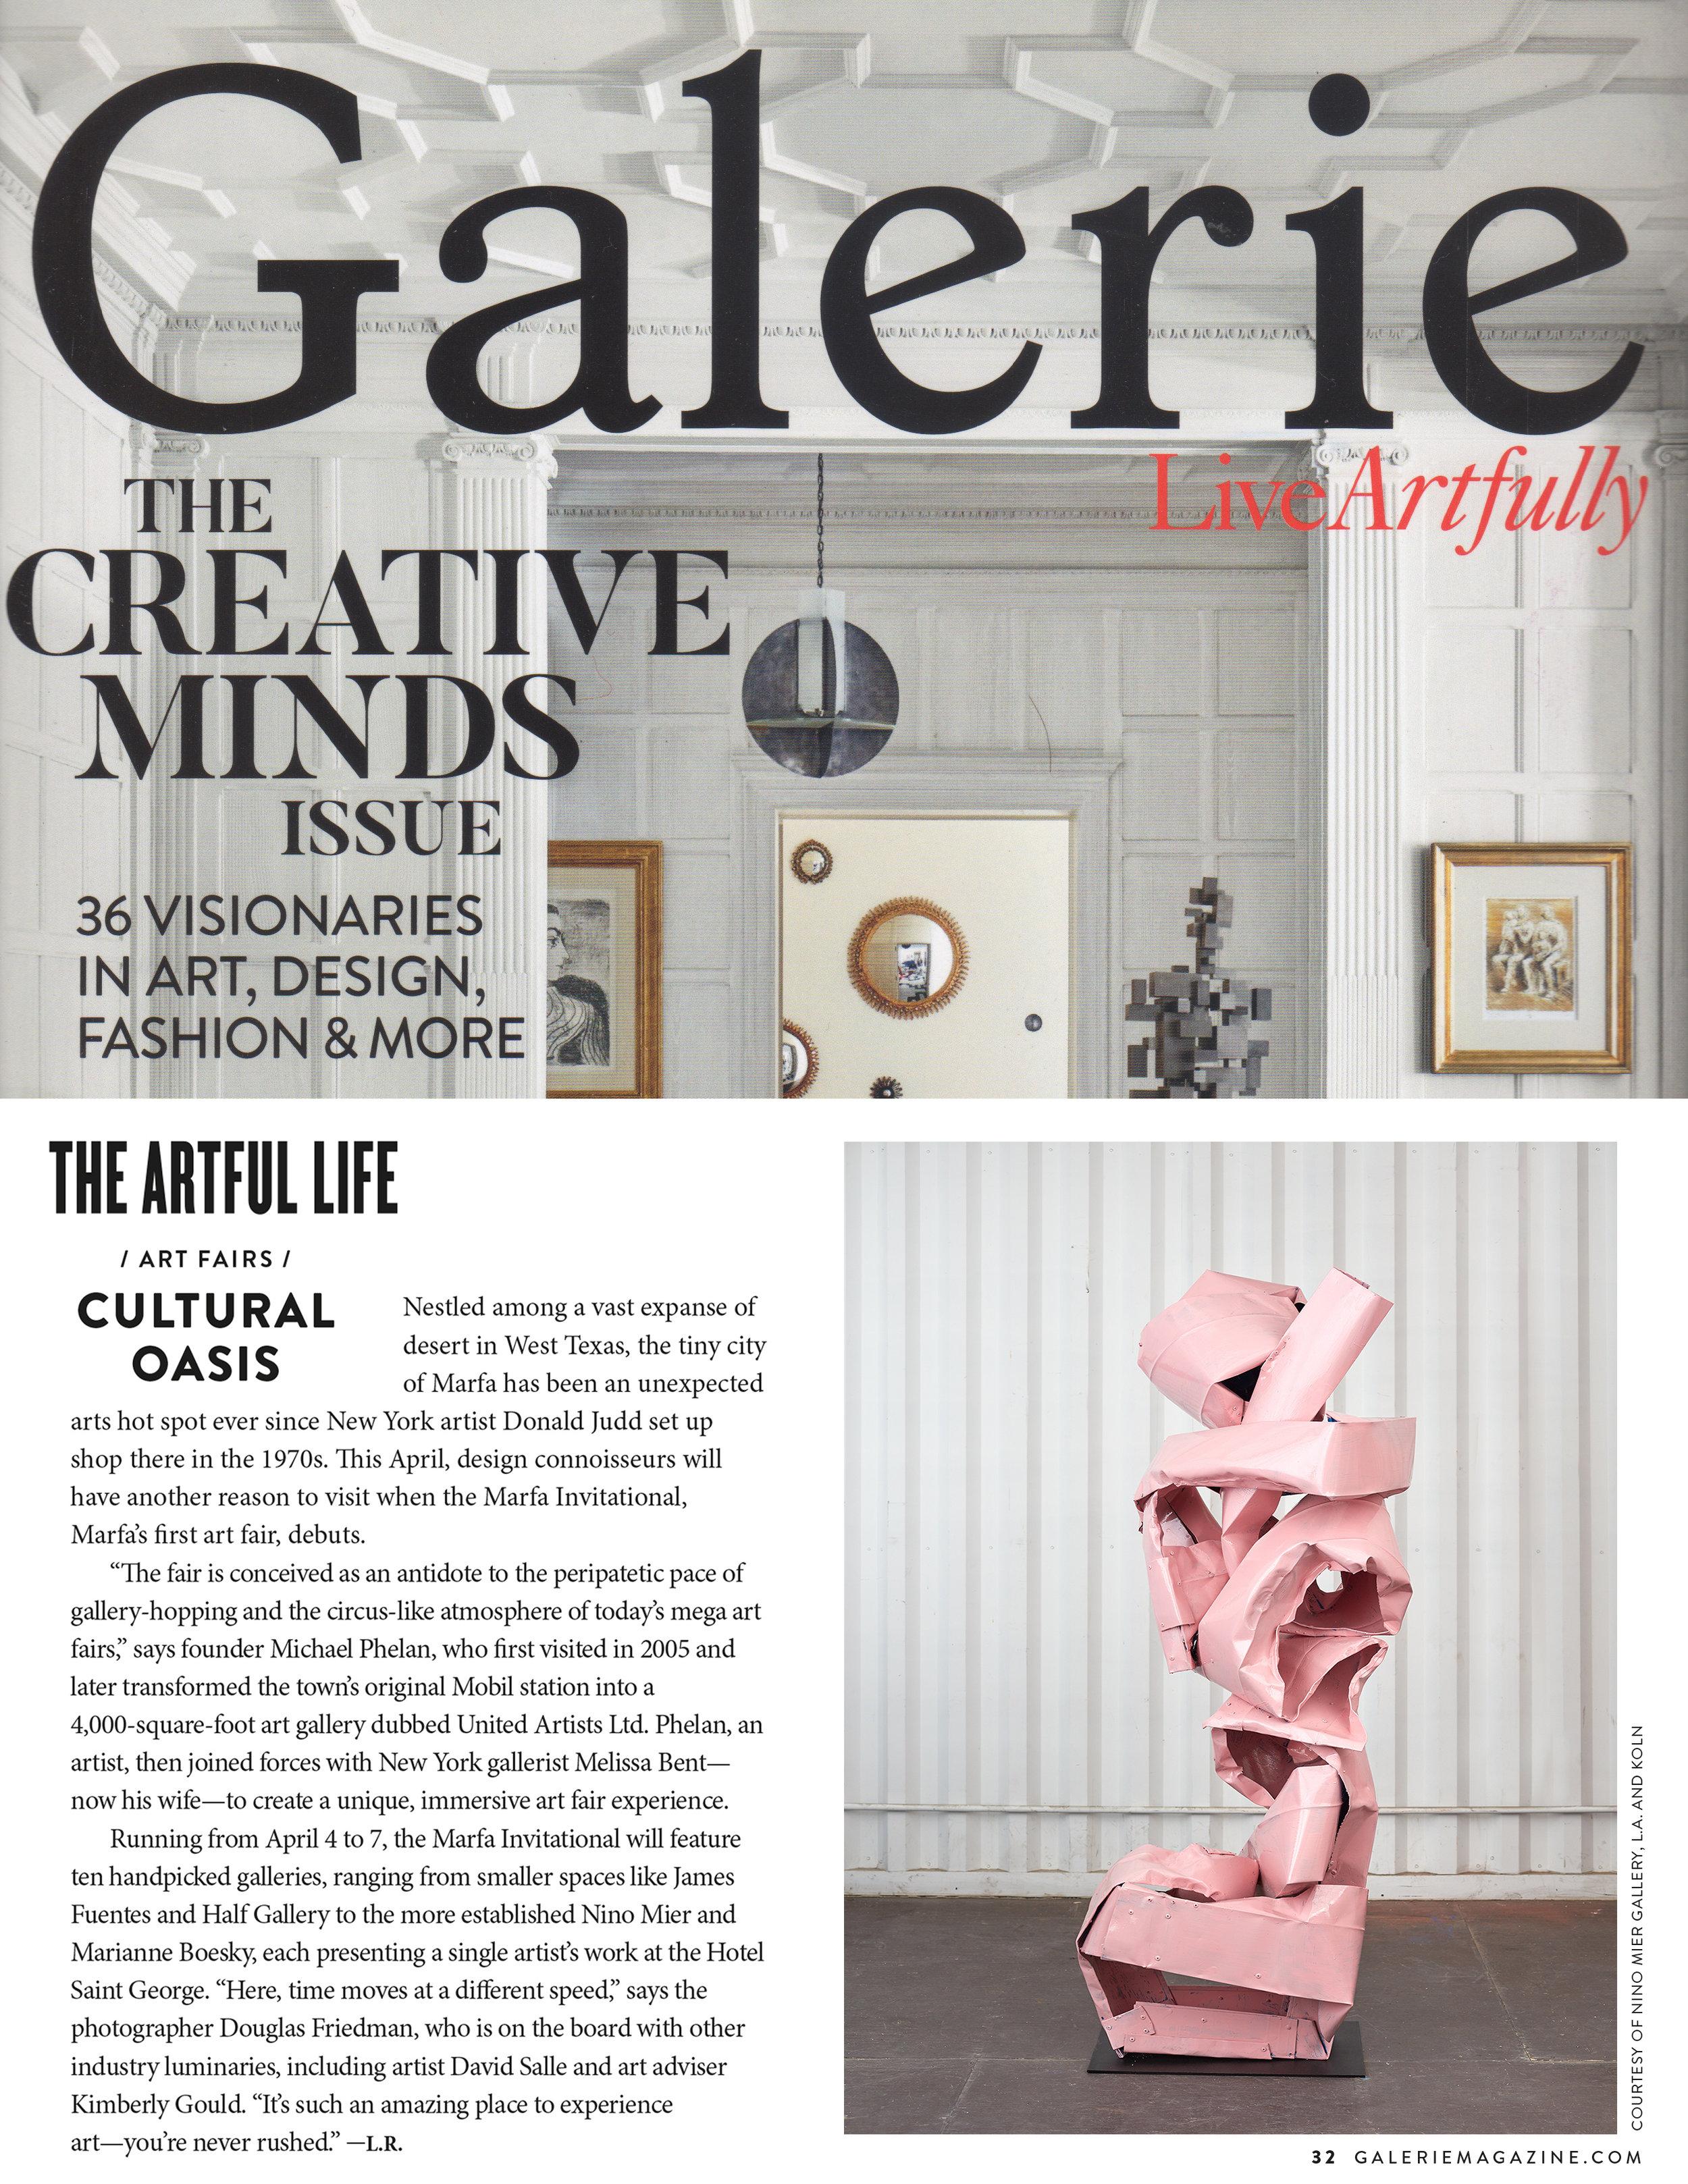 GALERIE Magazine-Live Artfully-March 2019.jpg